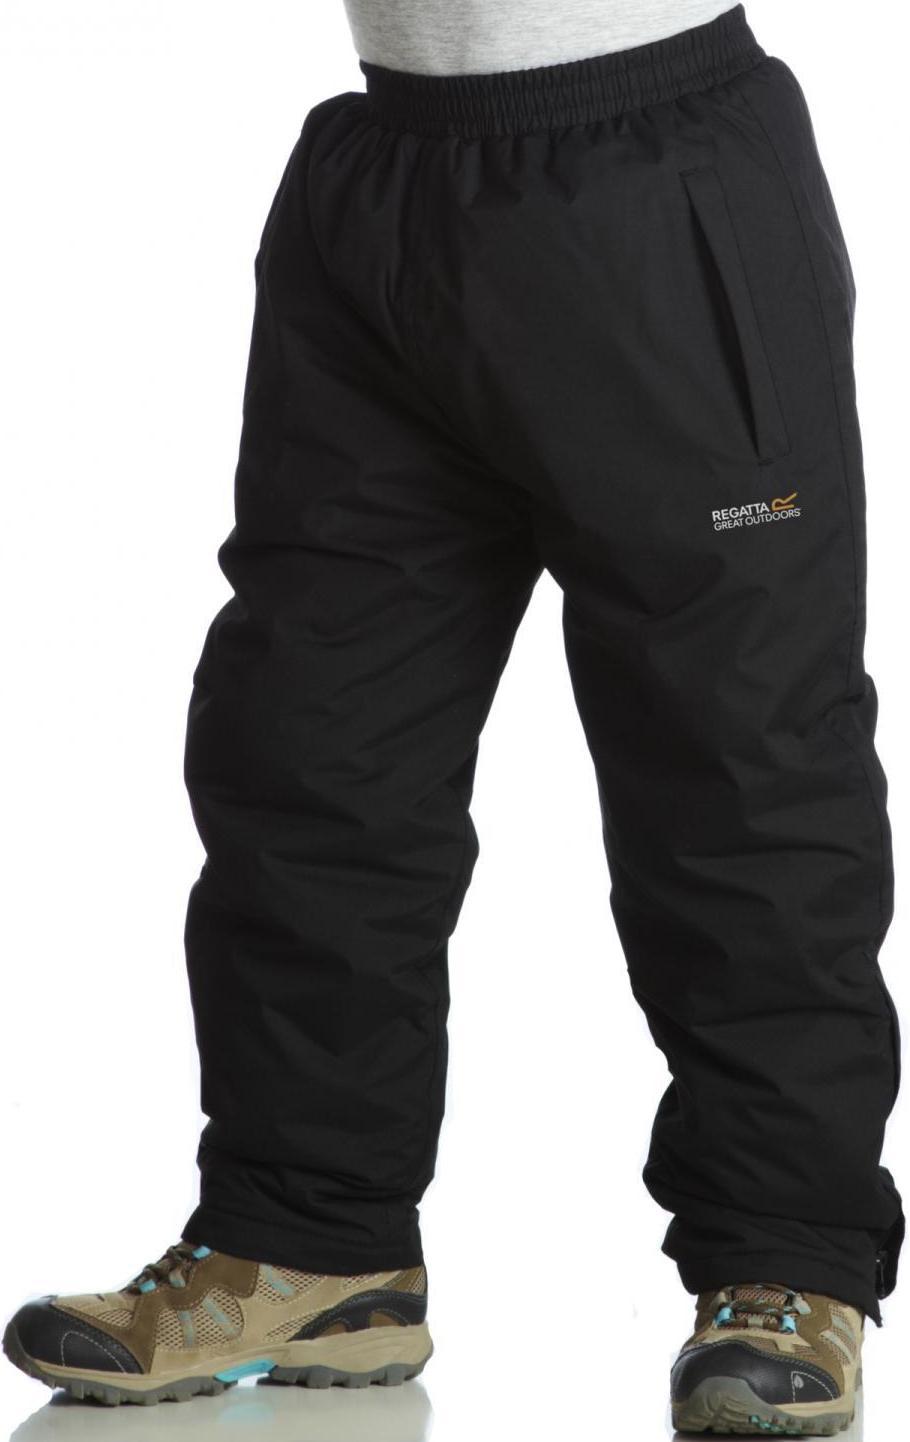 Regatta 兒童款 防水透氣保暖褲/雪褲 CO 防水透氣保暖中纖褲 Padded Chandler RKP062